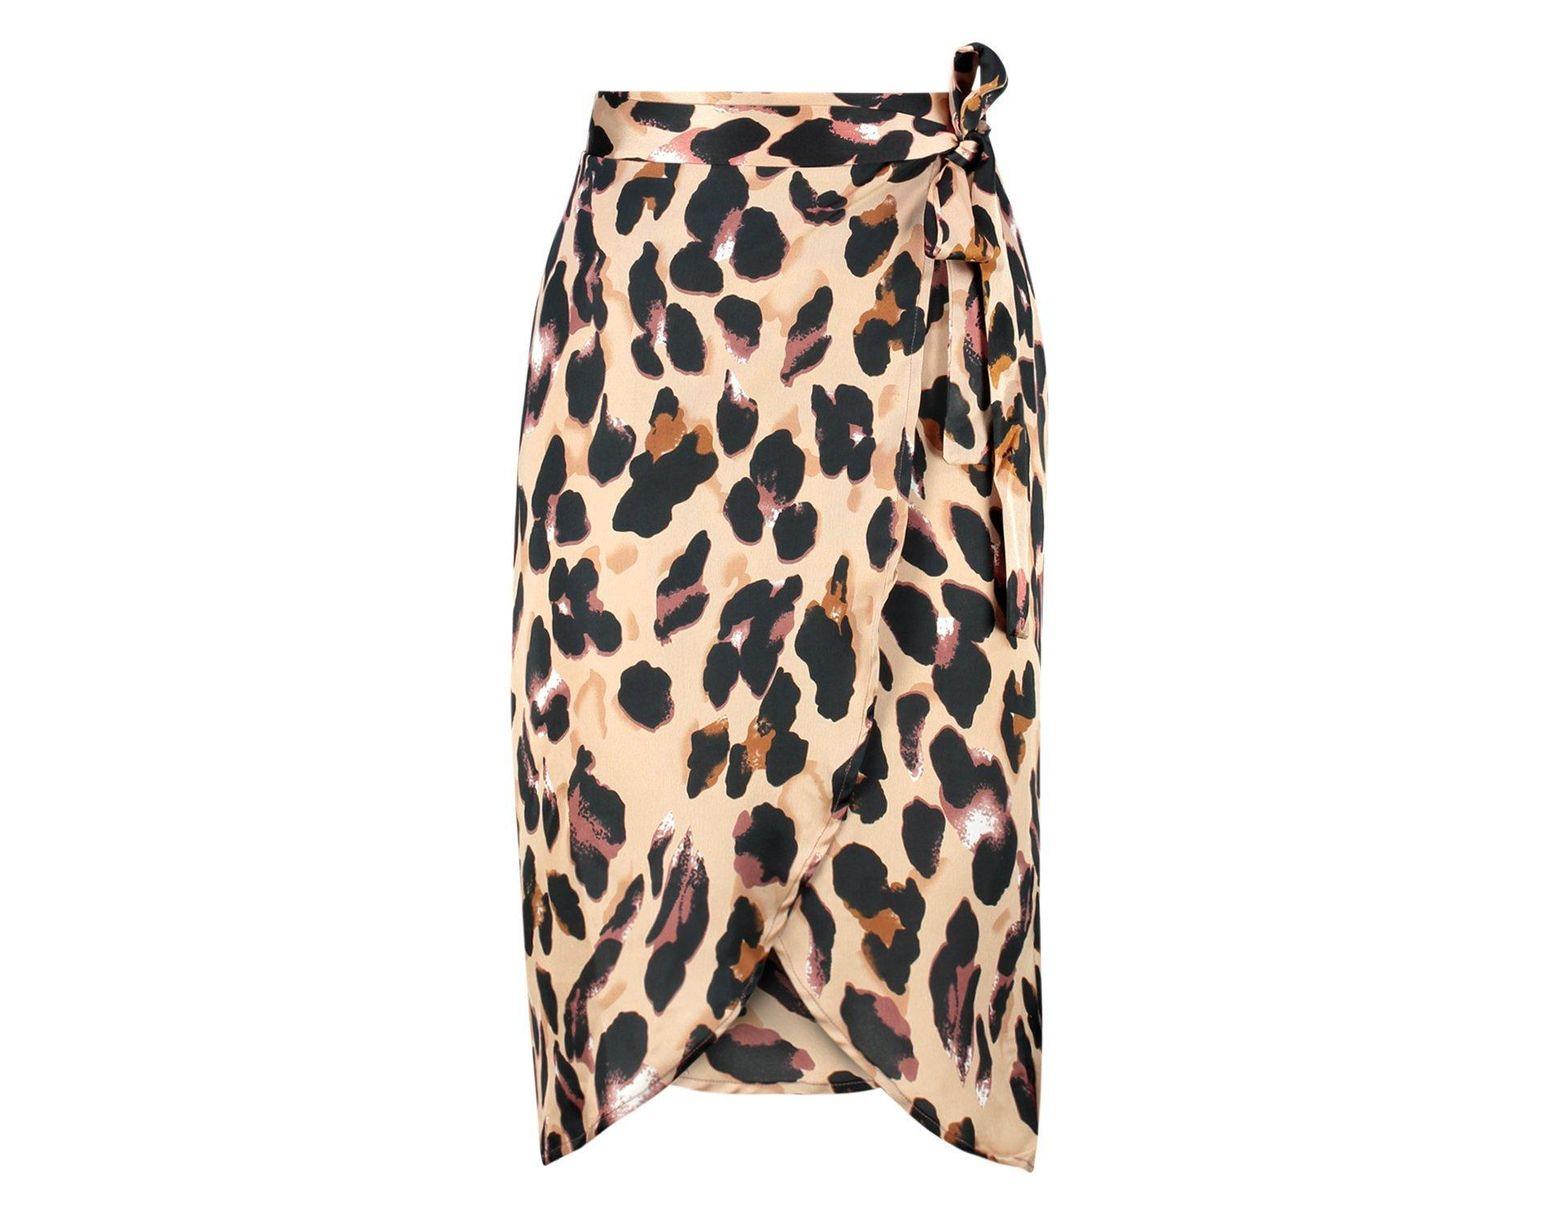 307353ec8c Boohoo Petite Leopard Print Satin Wrap Midi Skirt in Brown - Save 17% - Lyst